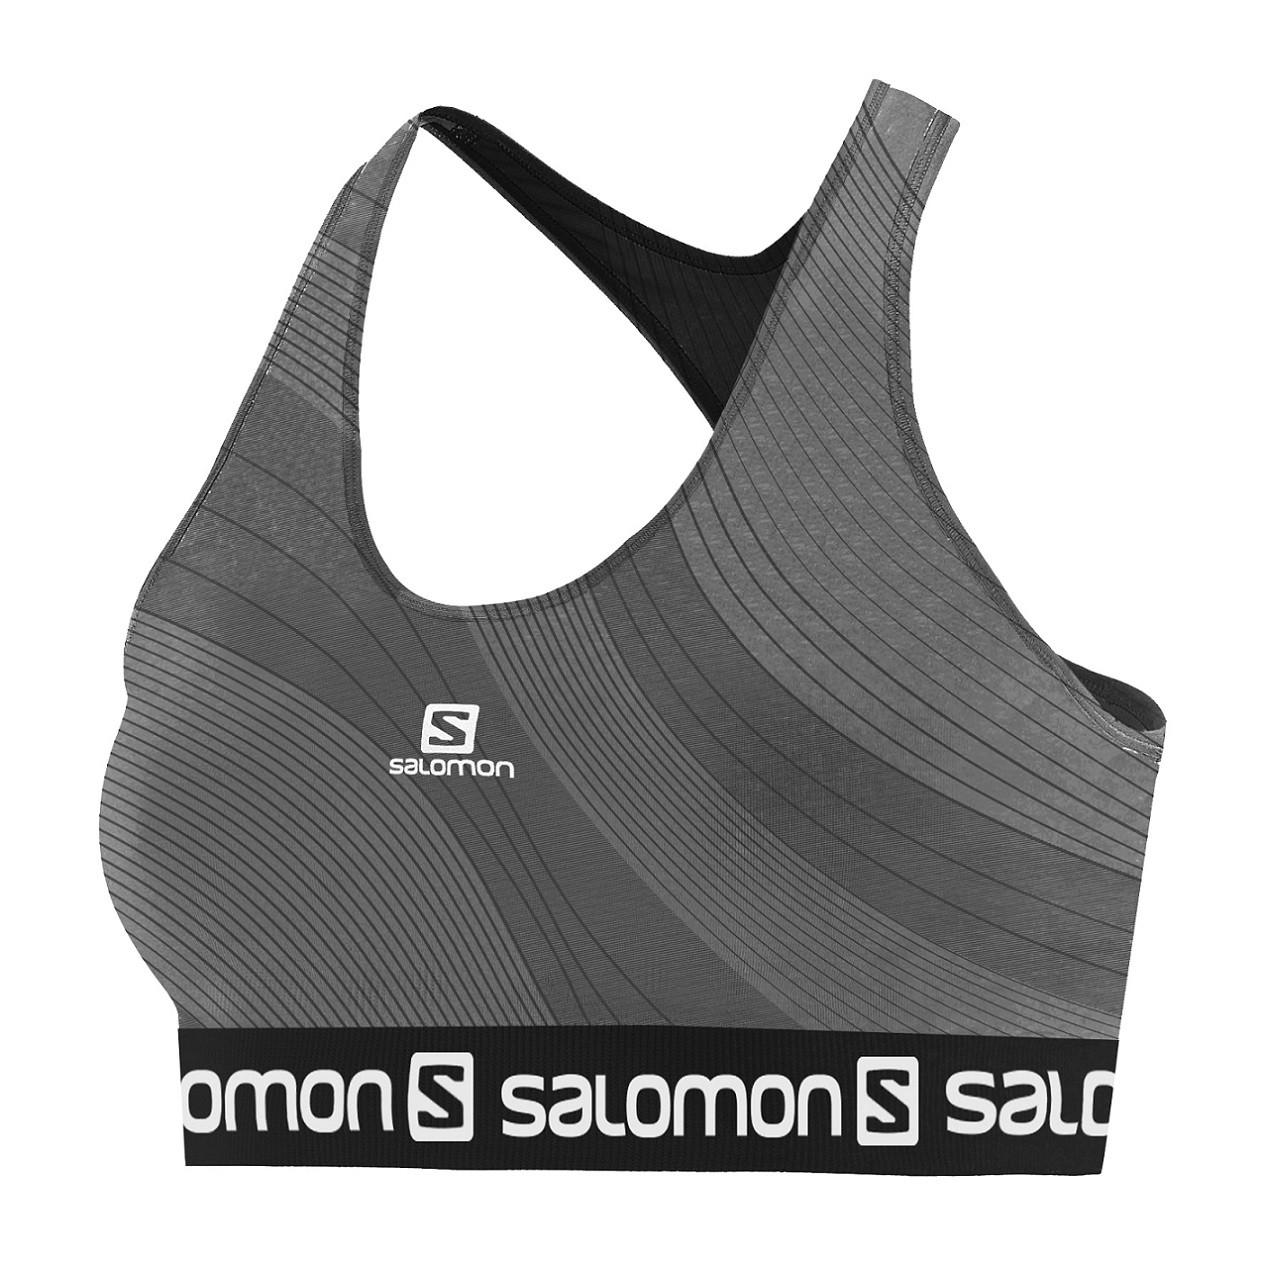 Top Impact Graphic Bra Soft Salomon